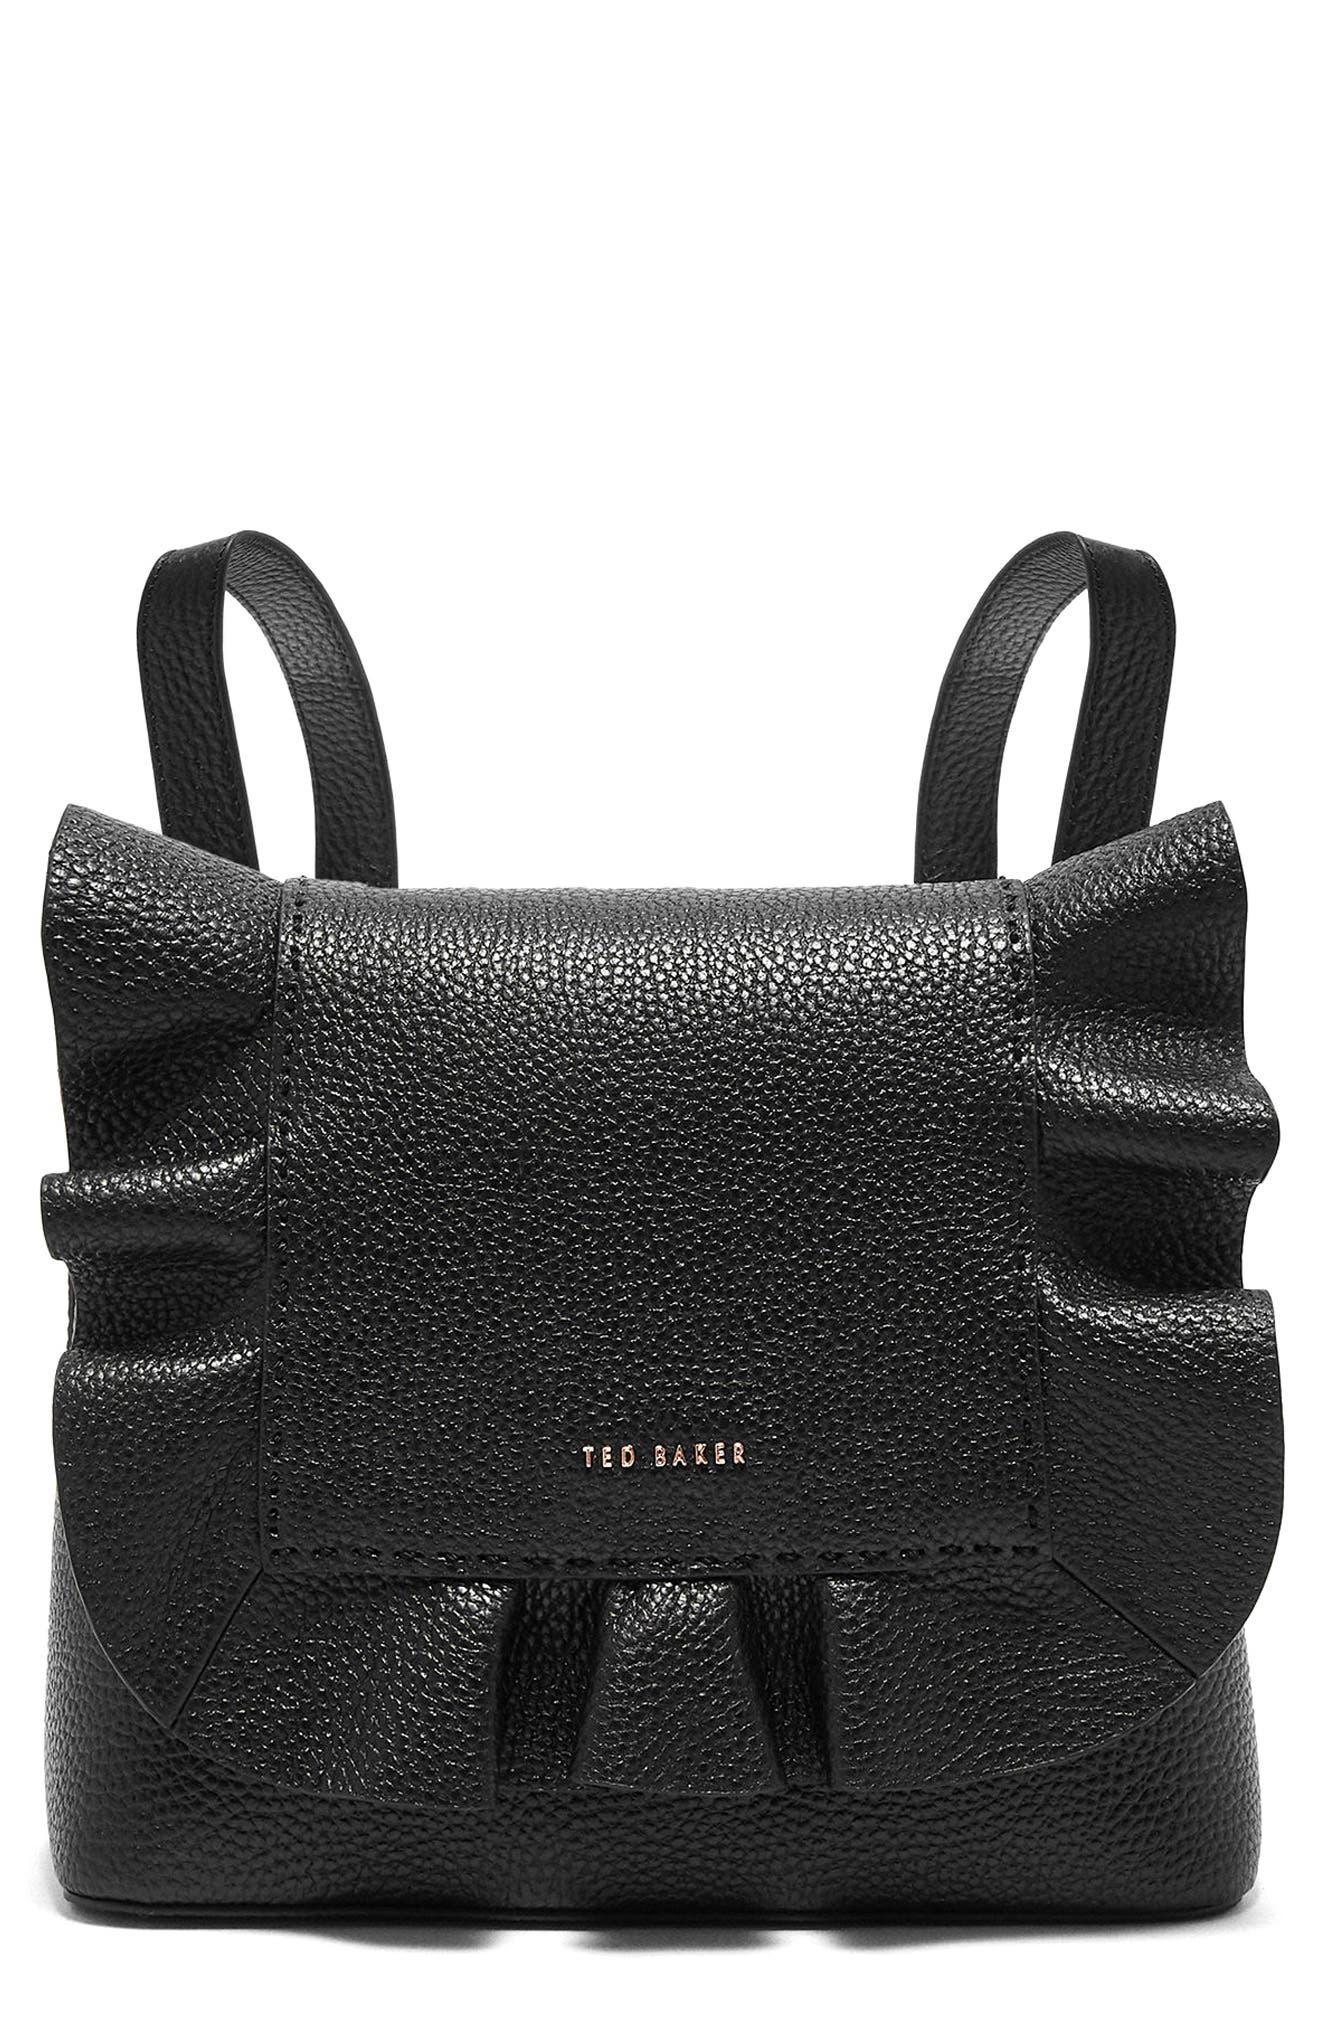 Rammira Leather Convertible Backpack,                             Main thumbnail 1, color,                             001